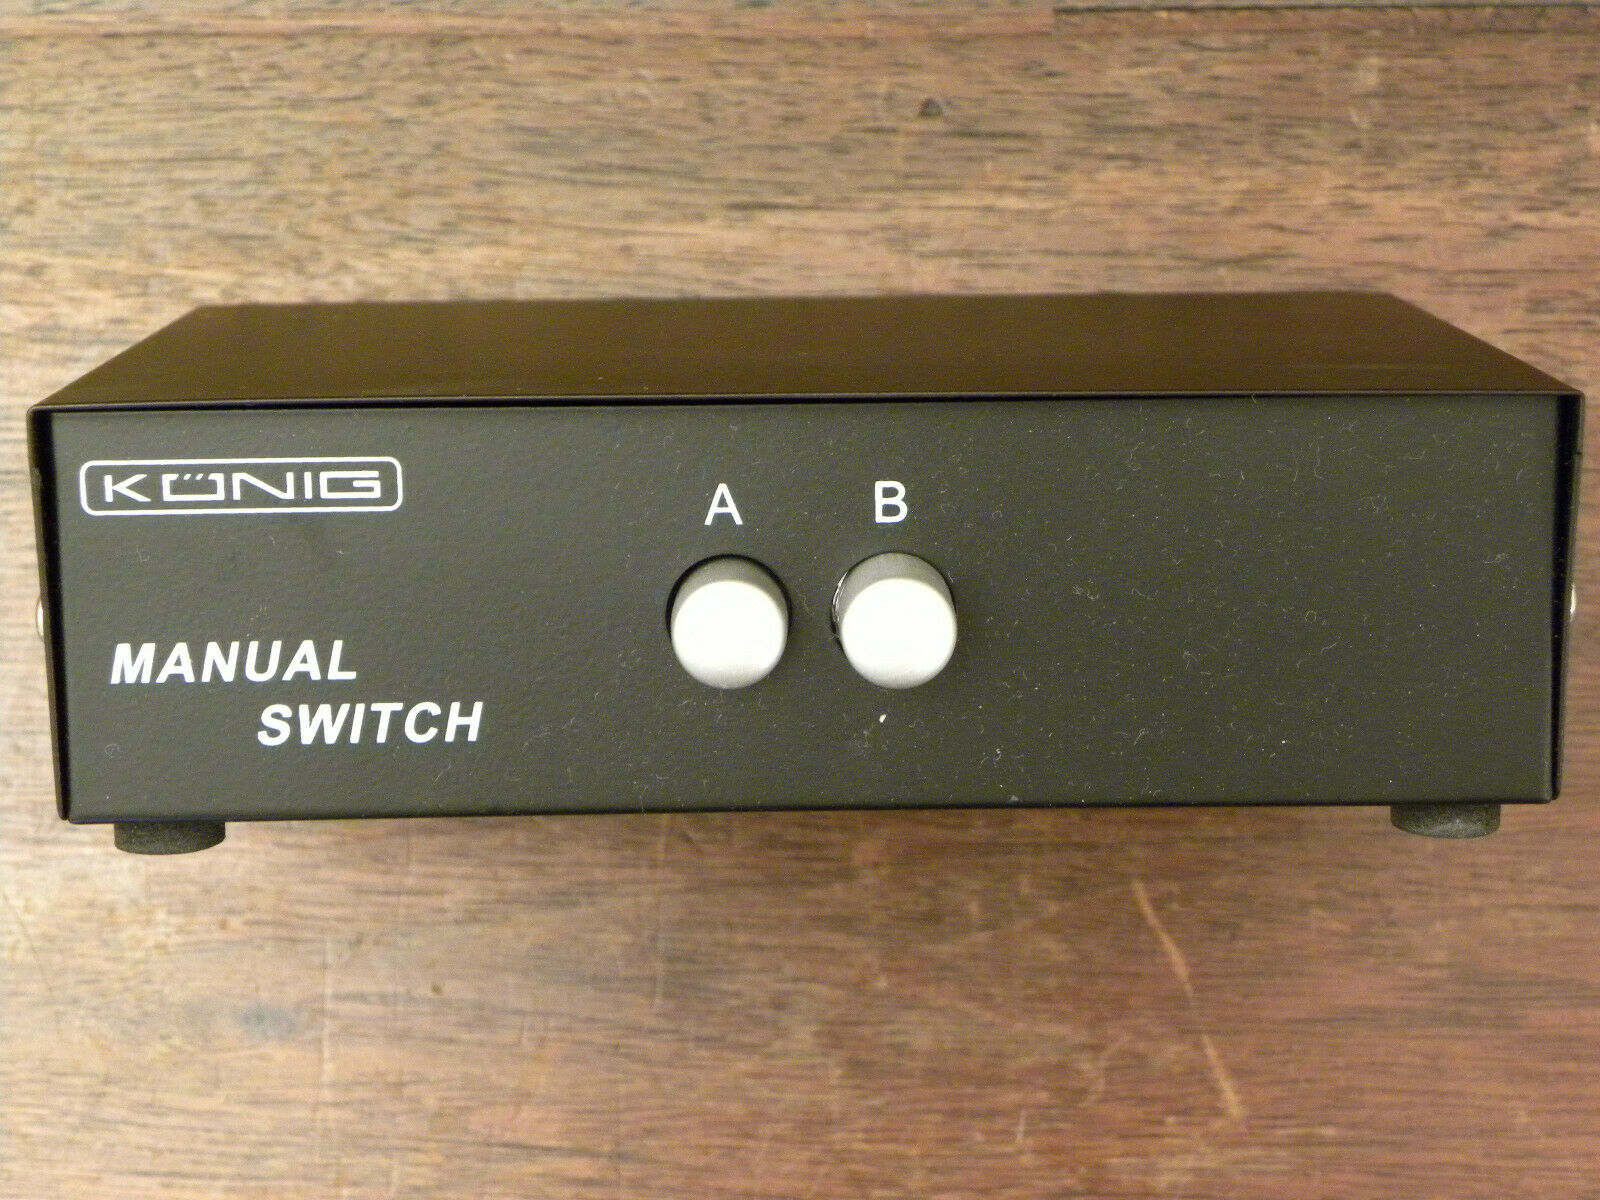 Konig 2 Port/Way VGA Manual Switch Box (Dual Link 2 In 1 PC Video Selector)